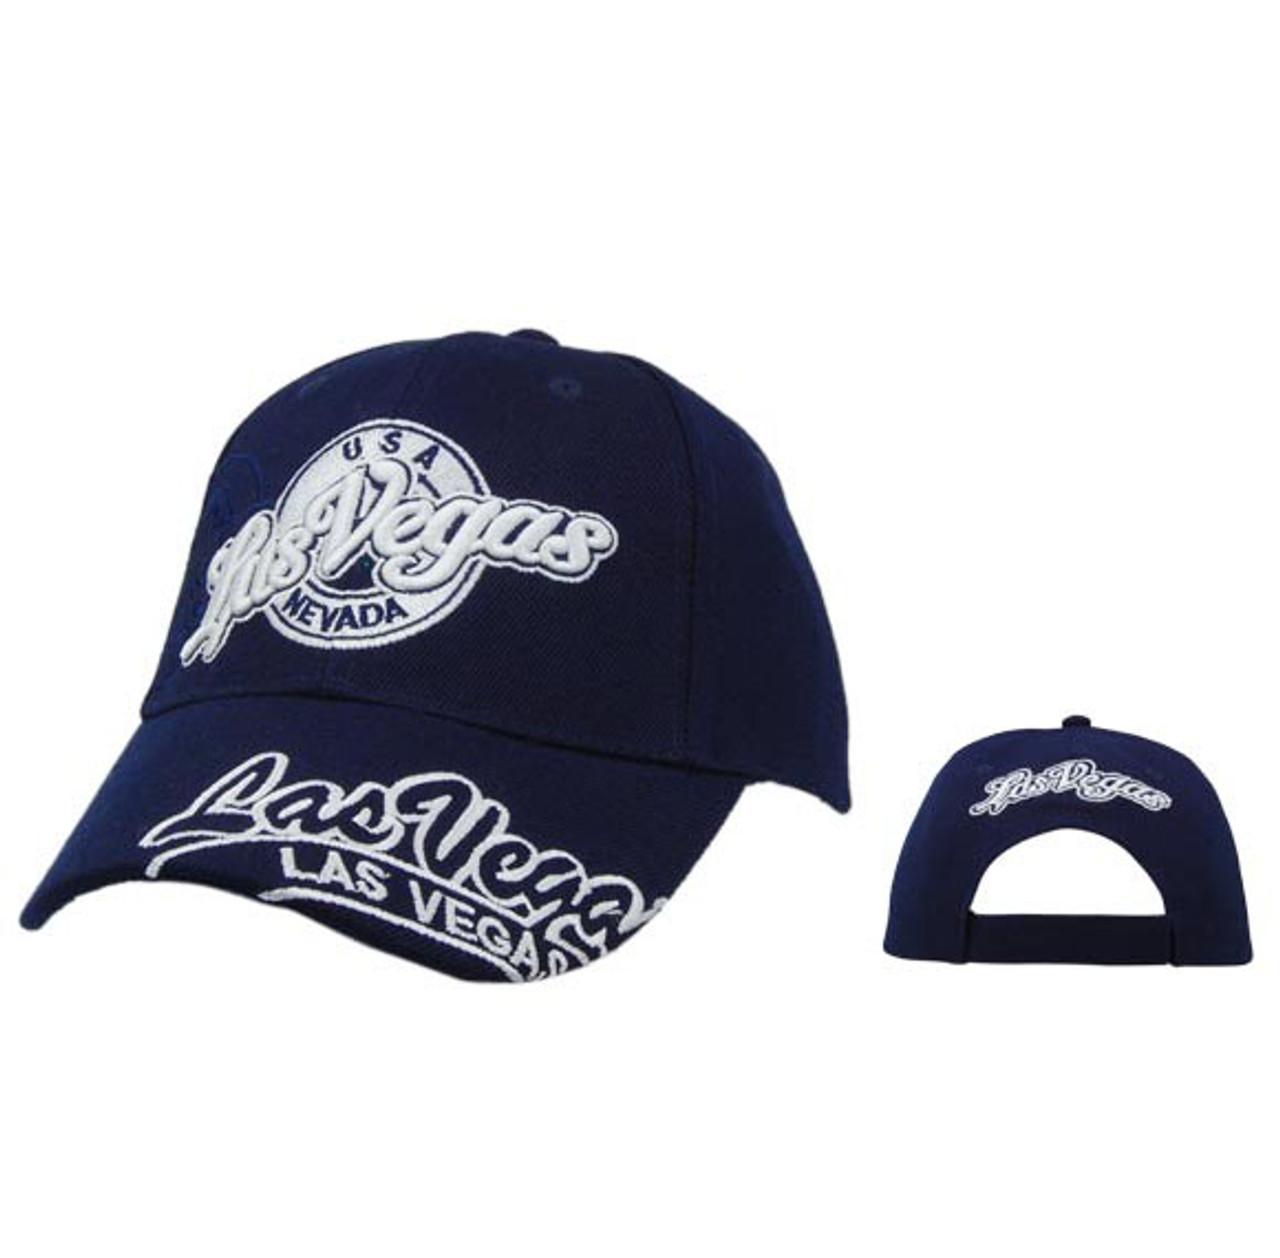 Blue Las Vegas Baseball Caps